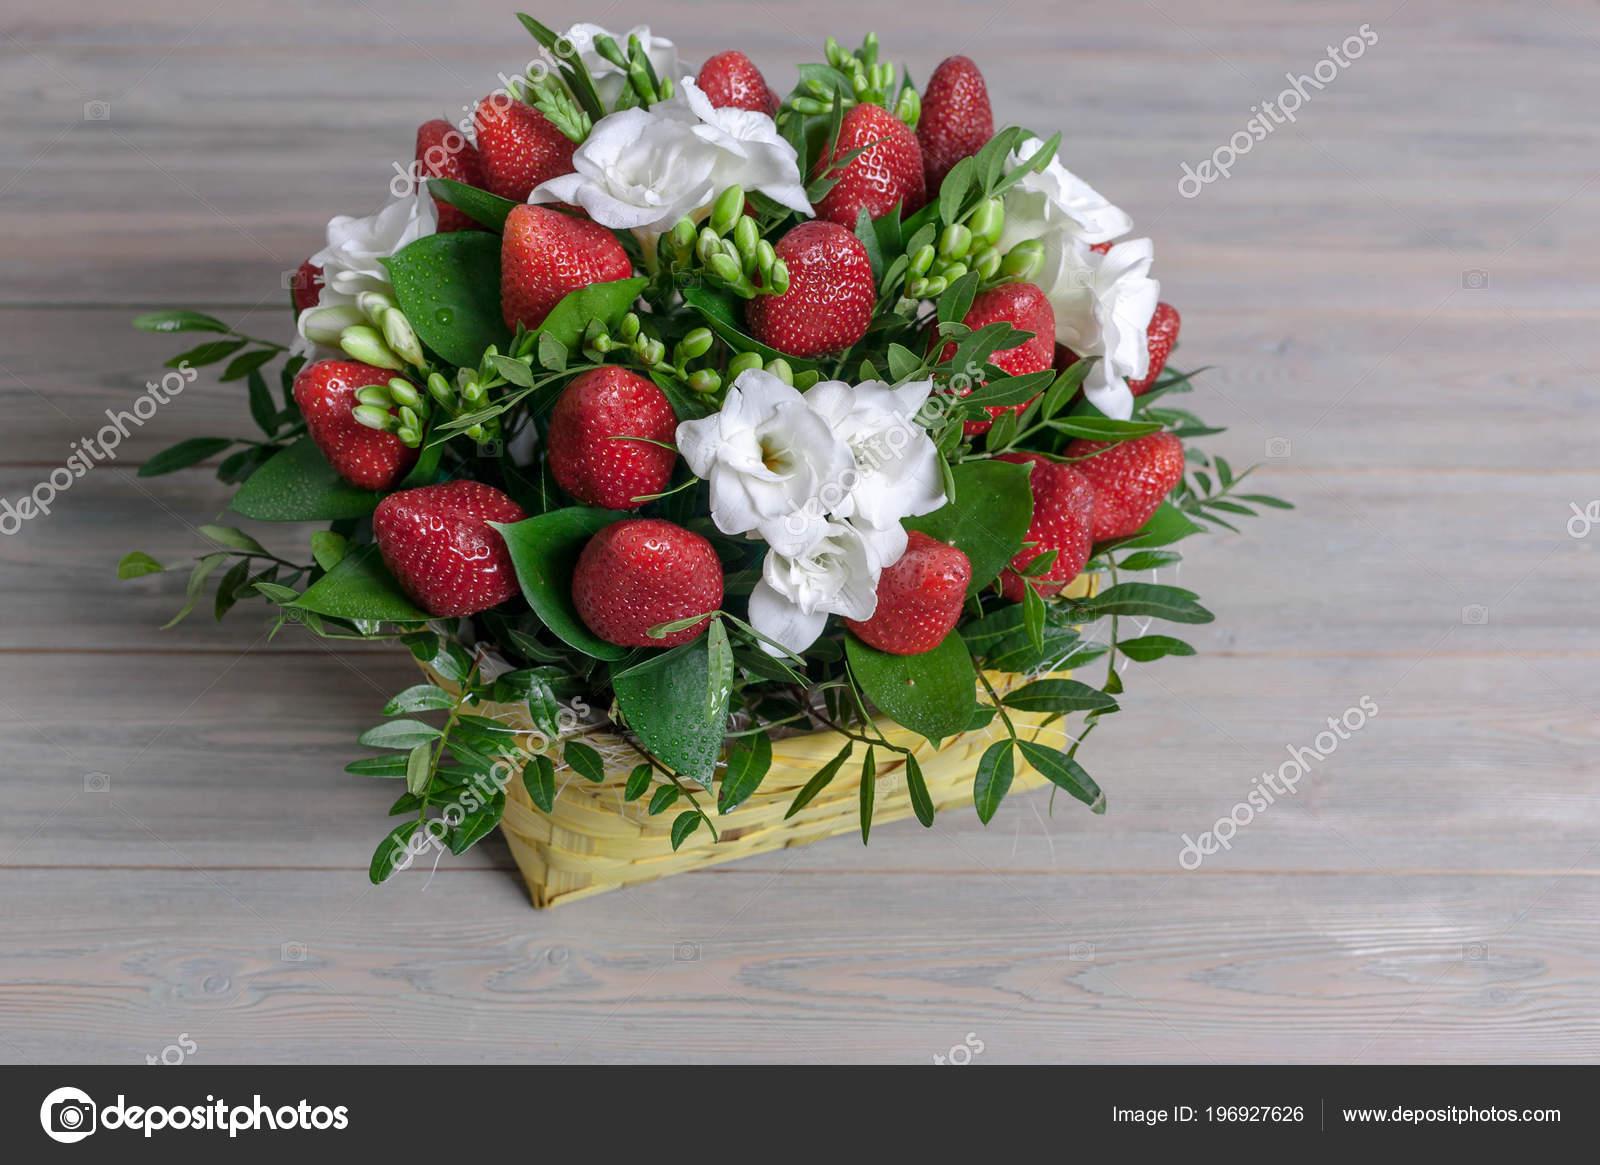 Bouquet Flowers Fruit Ripe Strawberry White Freesia Wooden Background Stock Photo C Yusev 196927626